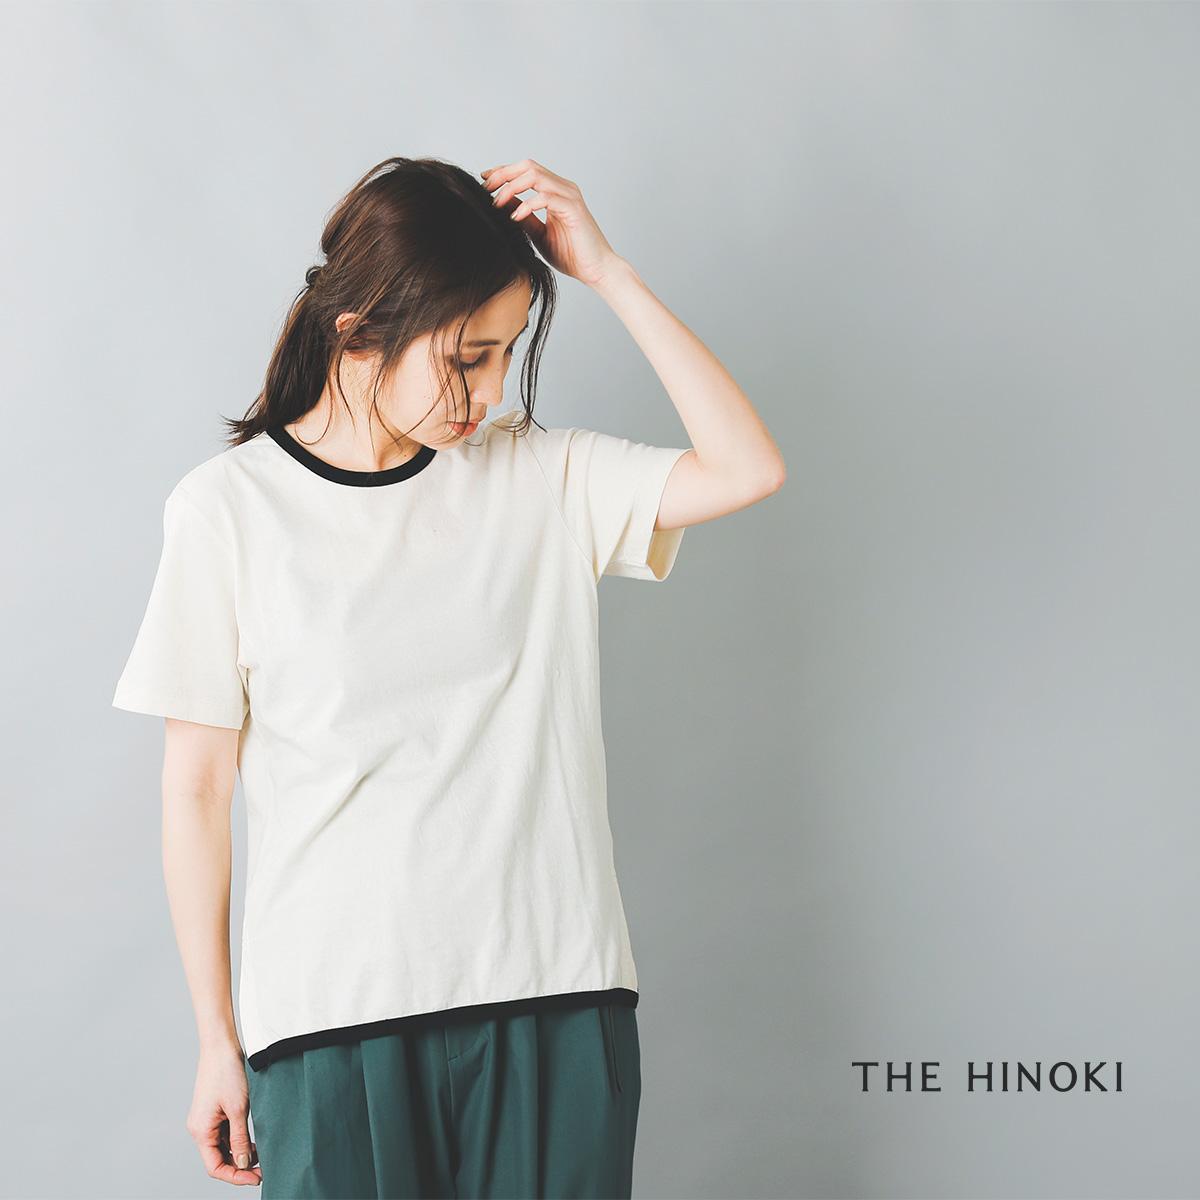 THE HINOKI(ザ ヒノキ)オーガニックコットンリンガーTシャツ th20s-33-nt